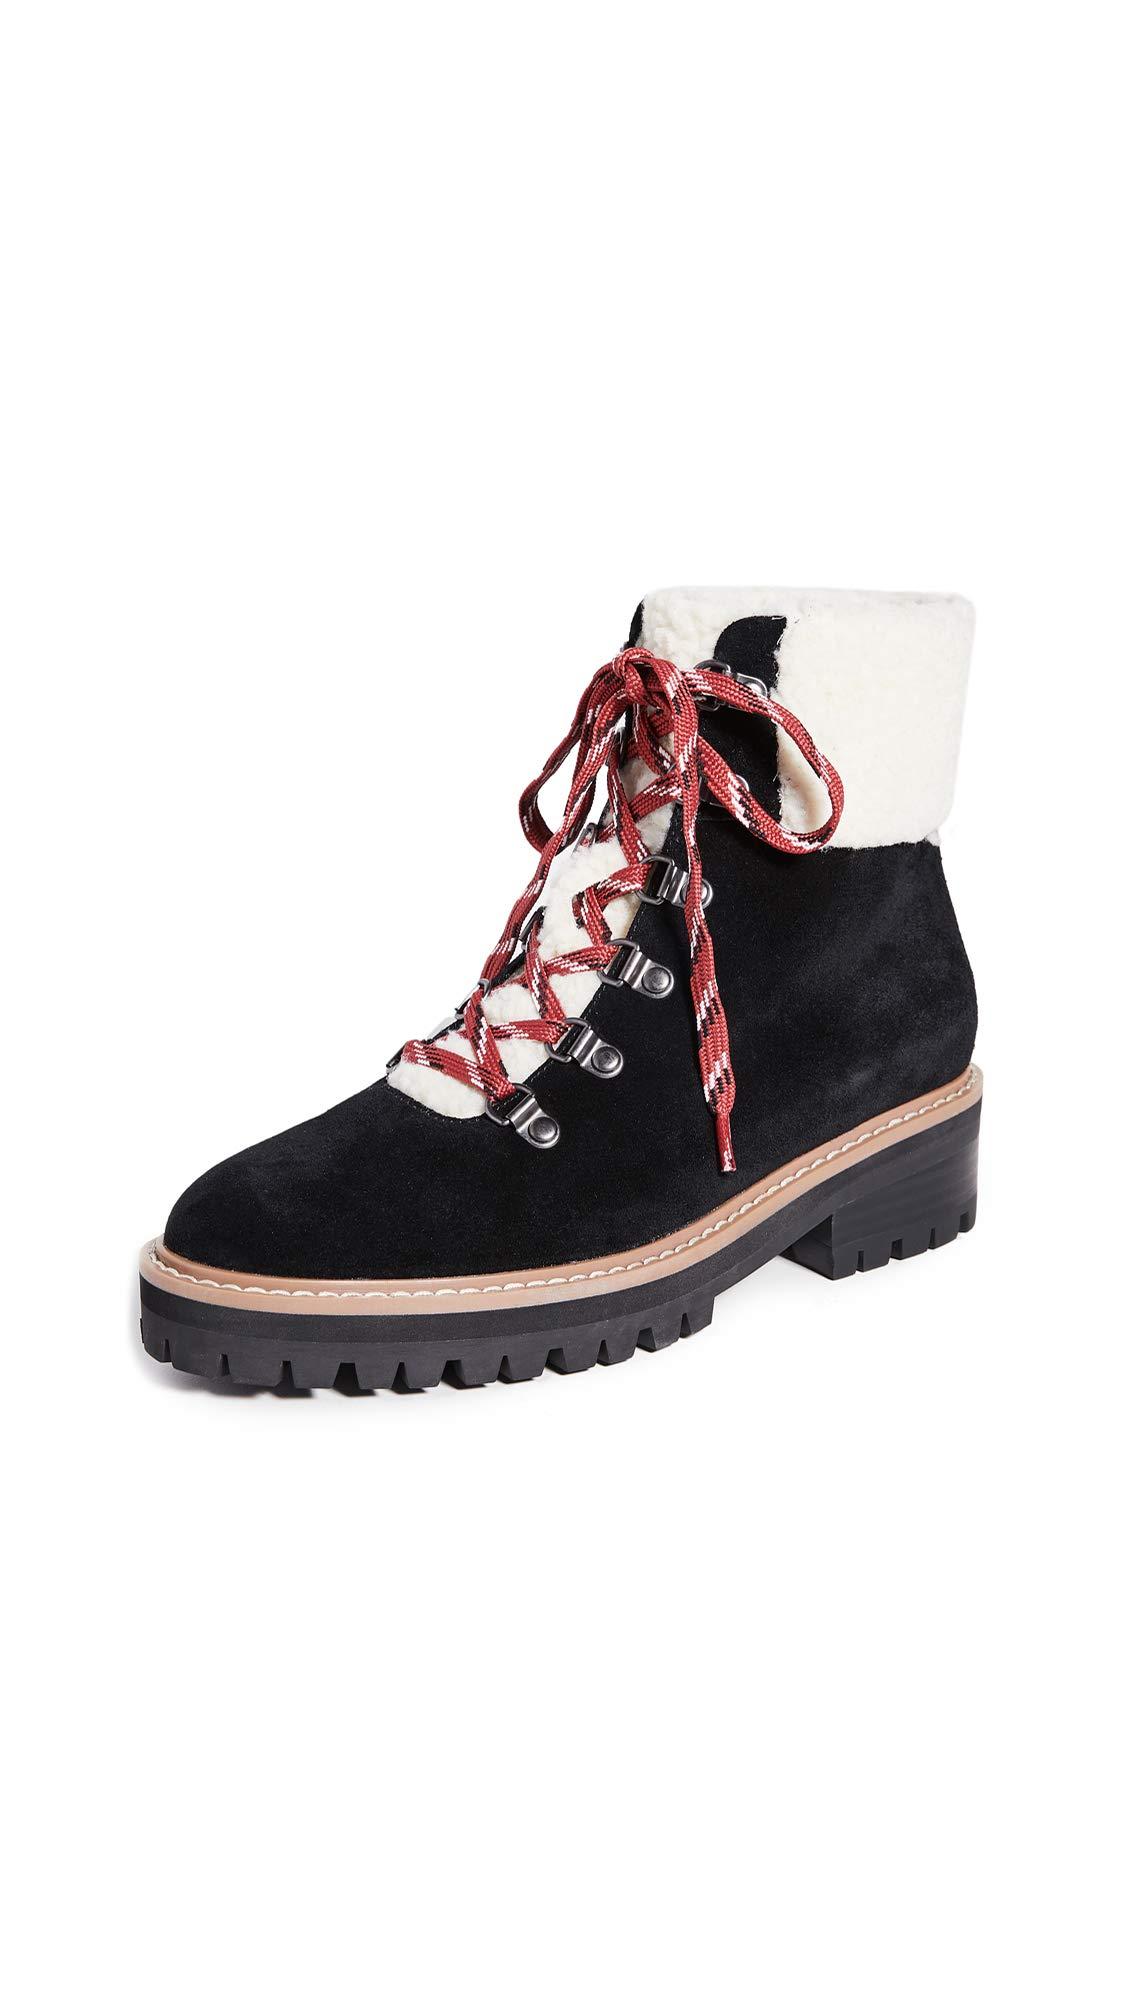 Villa Rouge Women's Miloh Hiking Boots